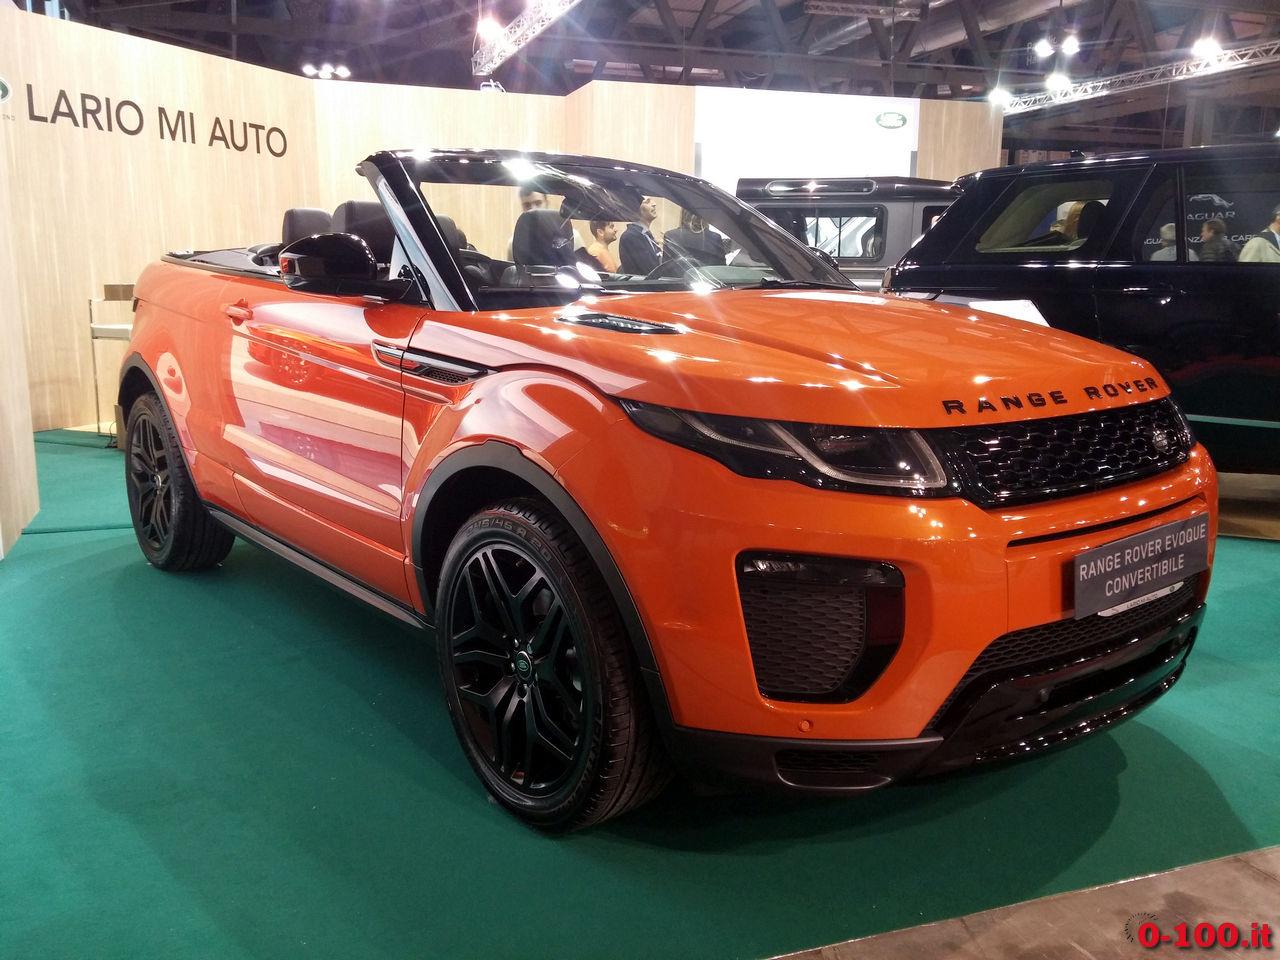 duemila-ruote-milano-autoclassica-rm-sothebys-0-100-range-rover-evoque_6